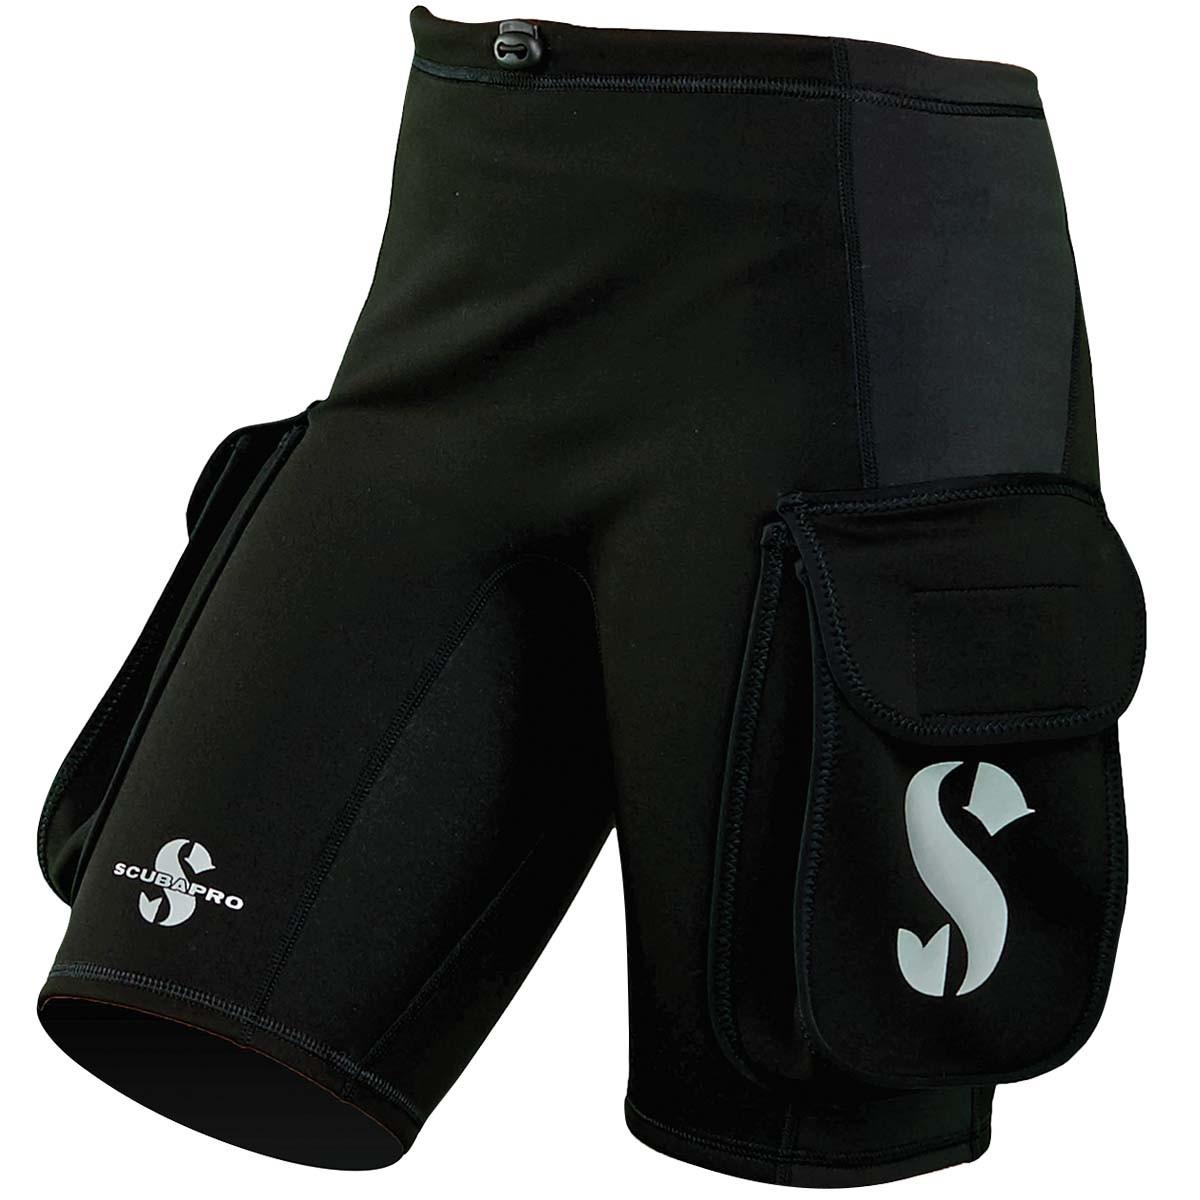 Scubapro Hybrid Women's Cargo Shorts